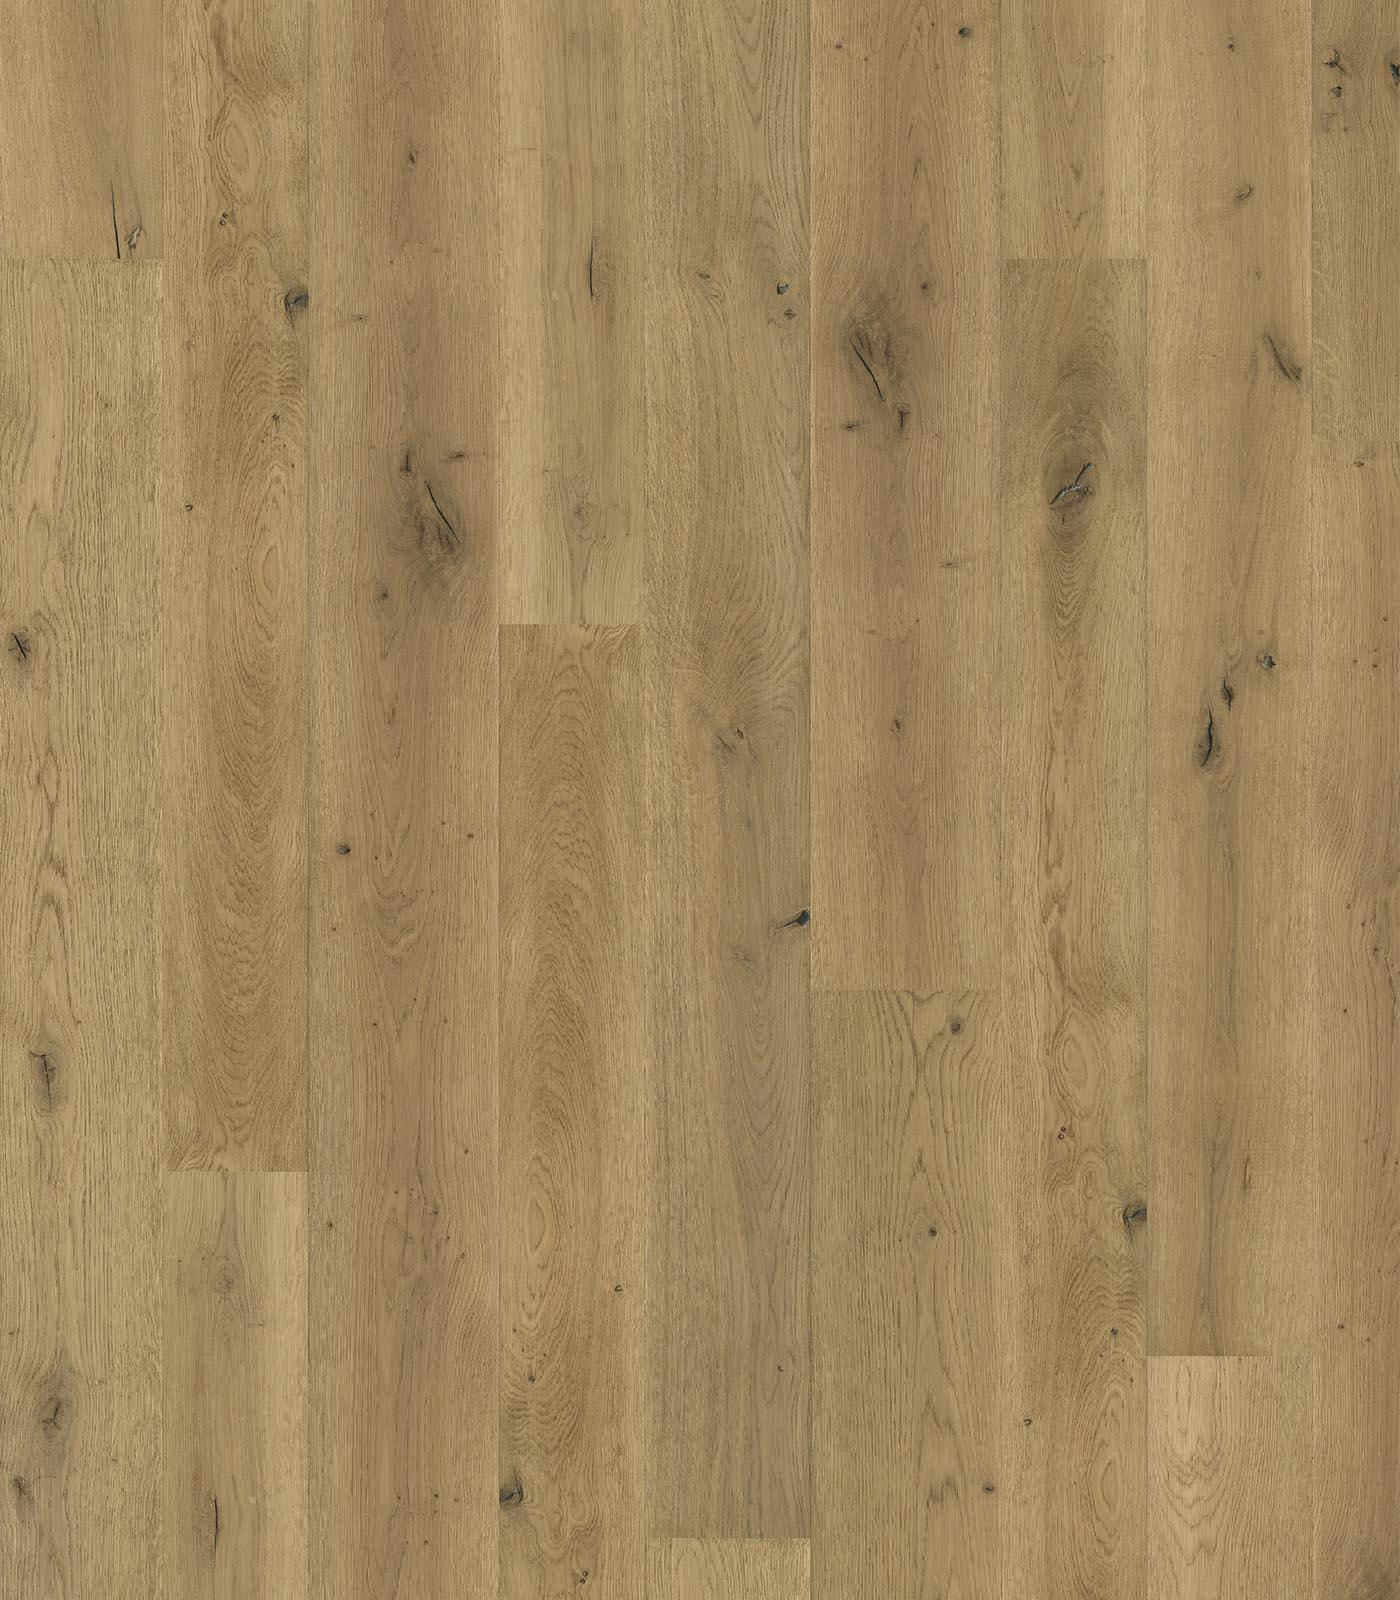 Evora-Heritage Collection-European Oak floors-flat